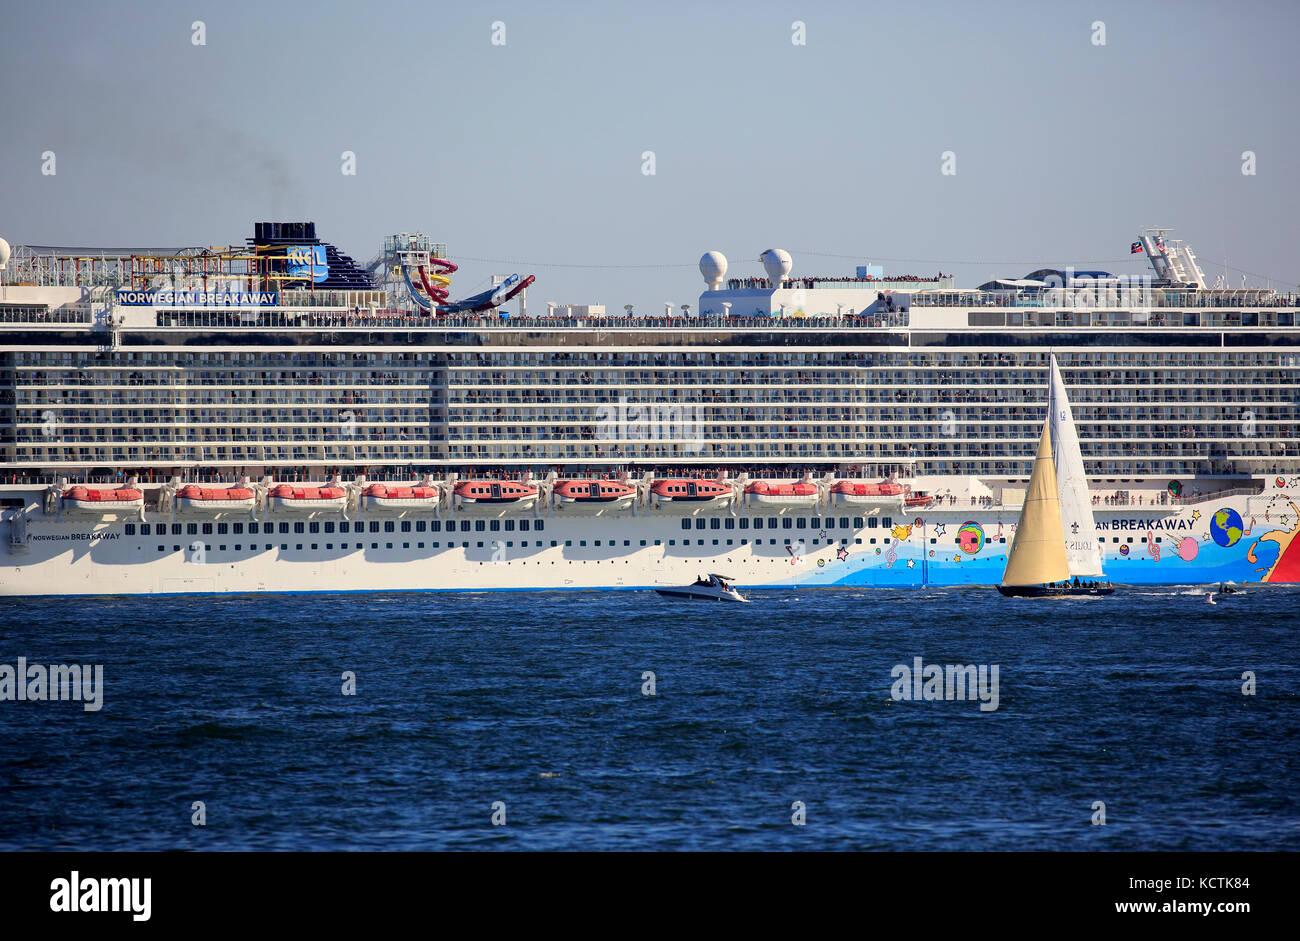 Norwegian Breakaway Cruise Ship In Hudson River With Sailboat In - Norwegian breakaway cruise ship